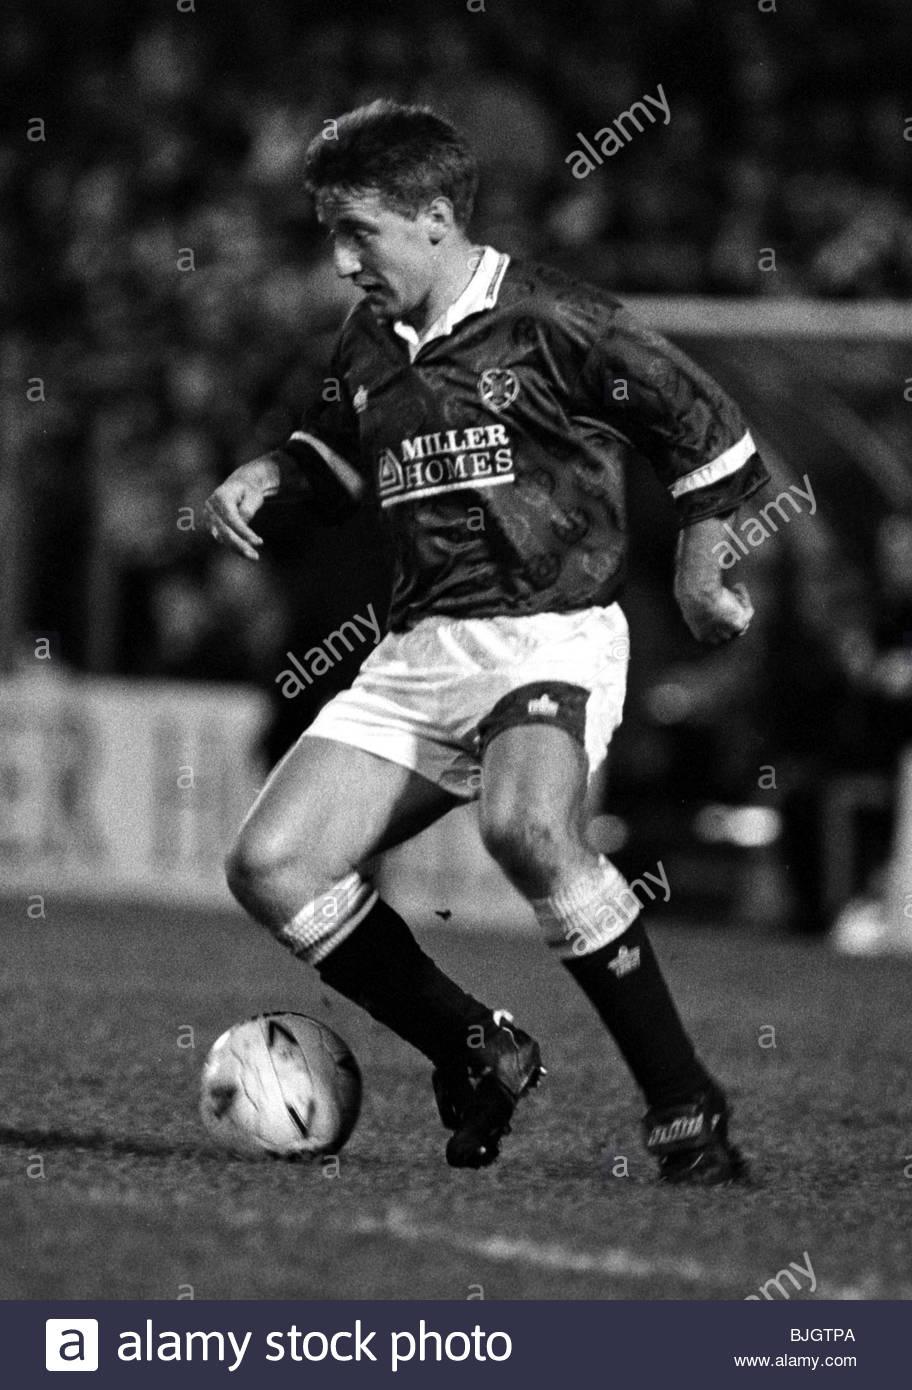 01/01/92 PREMIER DIVISION HEARTS v HIBS (1-1) TYNECASTLE - EDINBURGH John Robertson in action for Hearts. - Stock Image